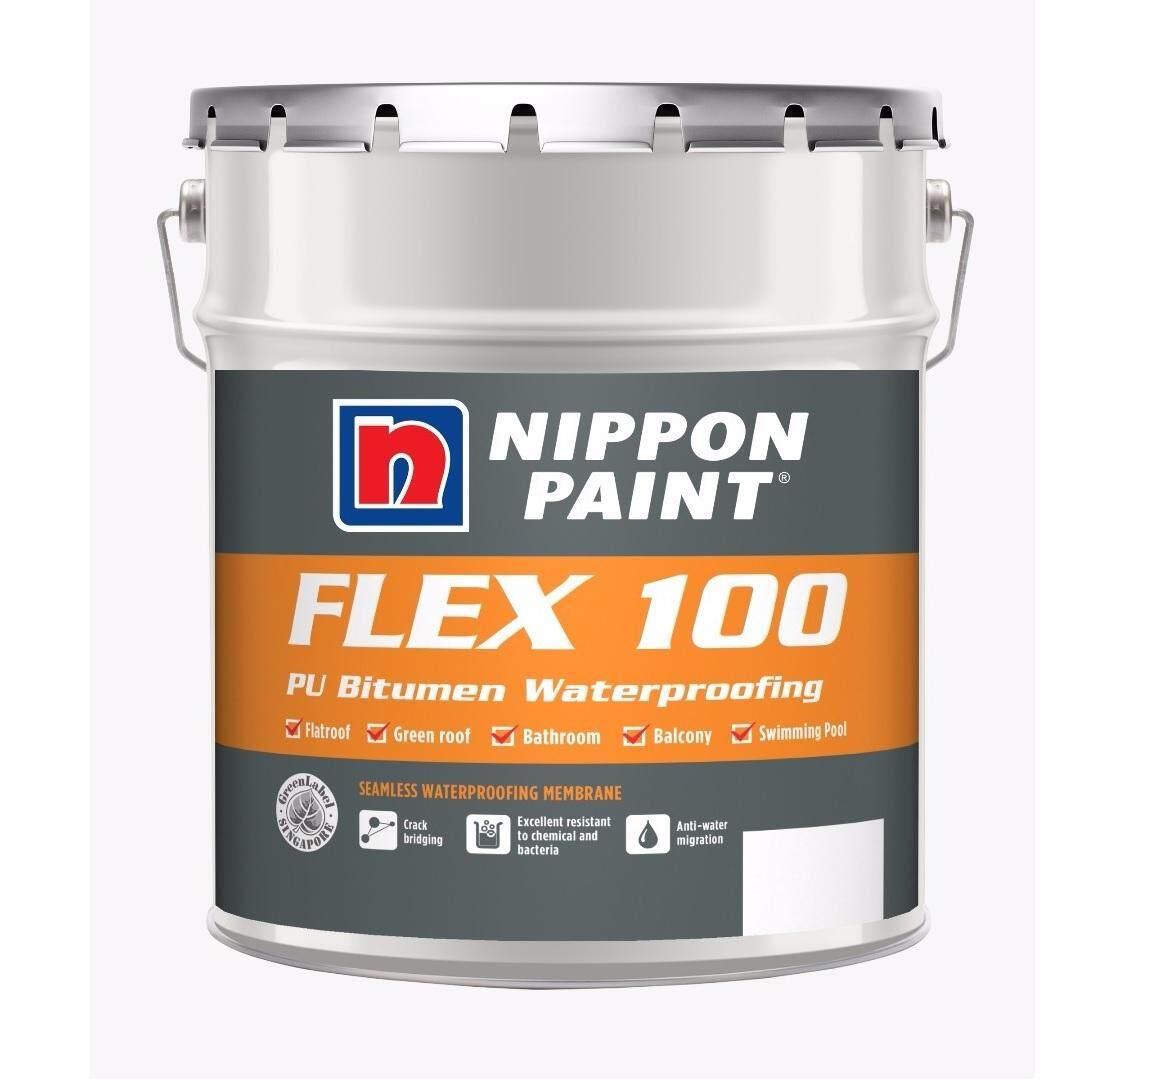 20KG NIPPON FLEX 100 WATER-BASED PU BITUMINOUS WATERPROOFING